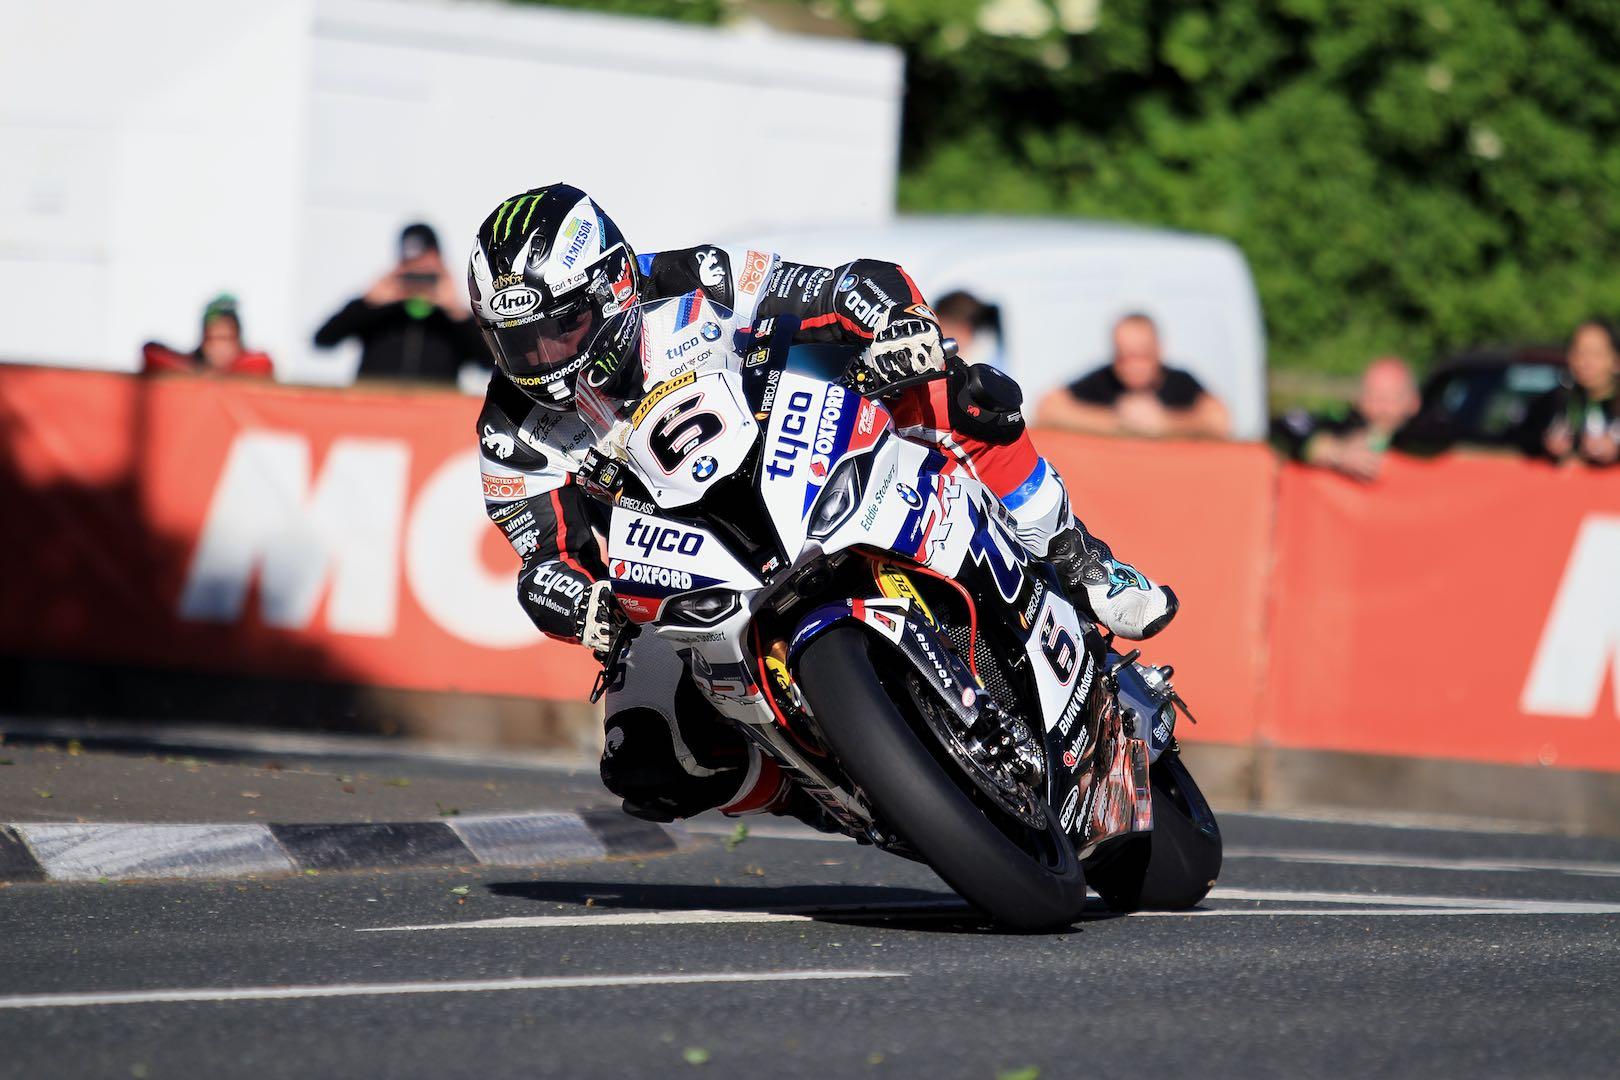 Michael Dunlop in Supersport TT